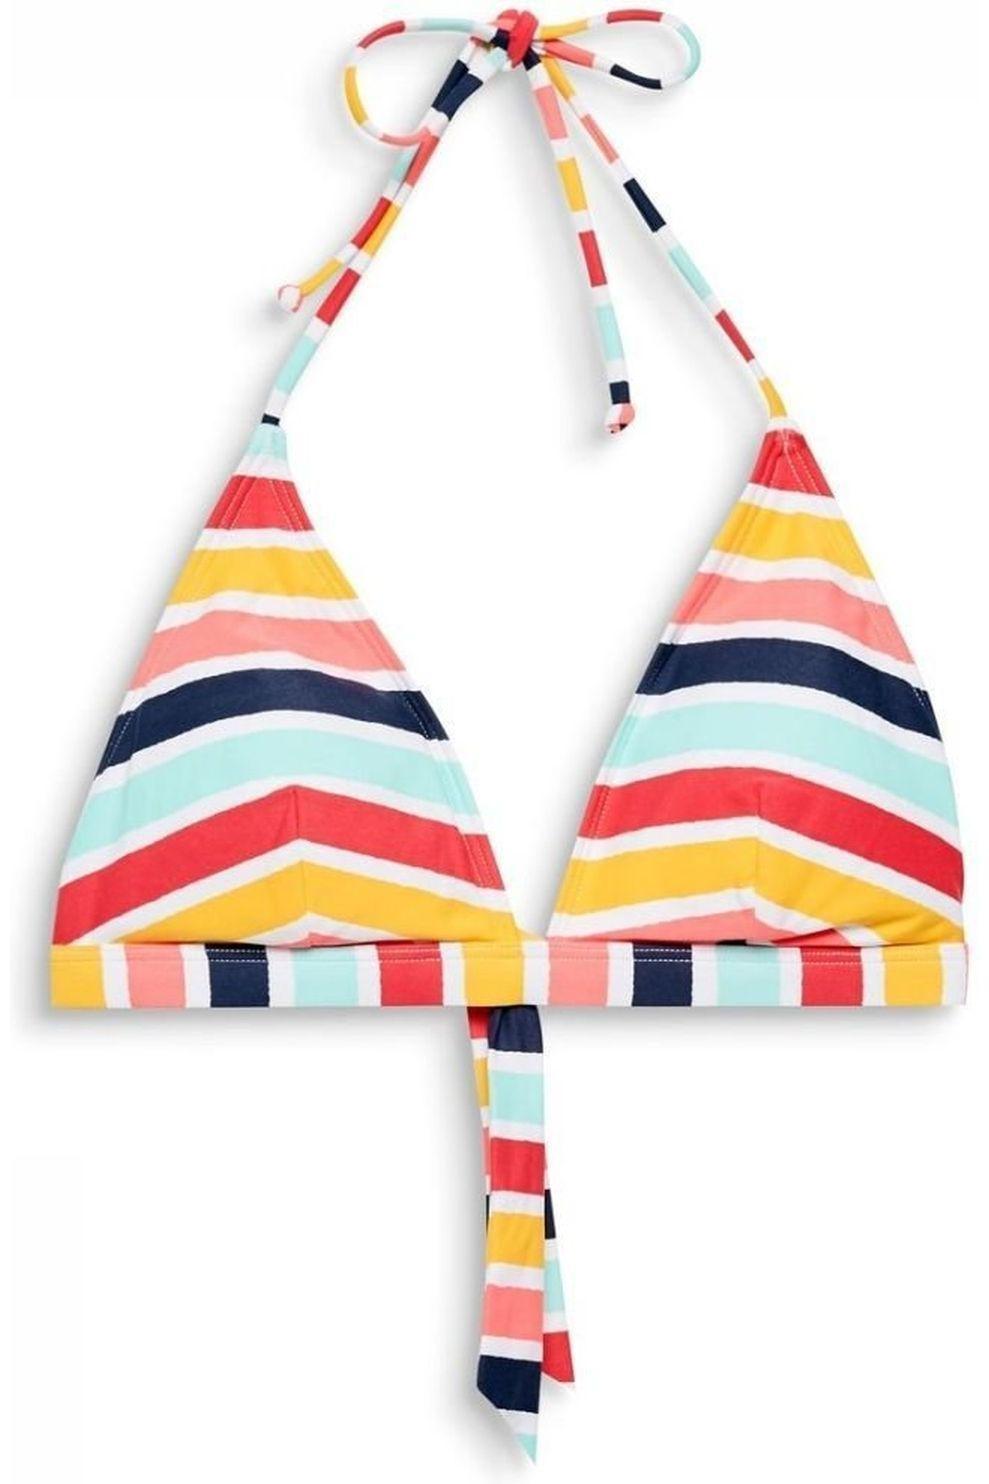 Esprit Bh Treasure Padded Triangle Cup Size B voor dames - Geel/Roze - Maat: 36